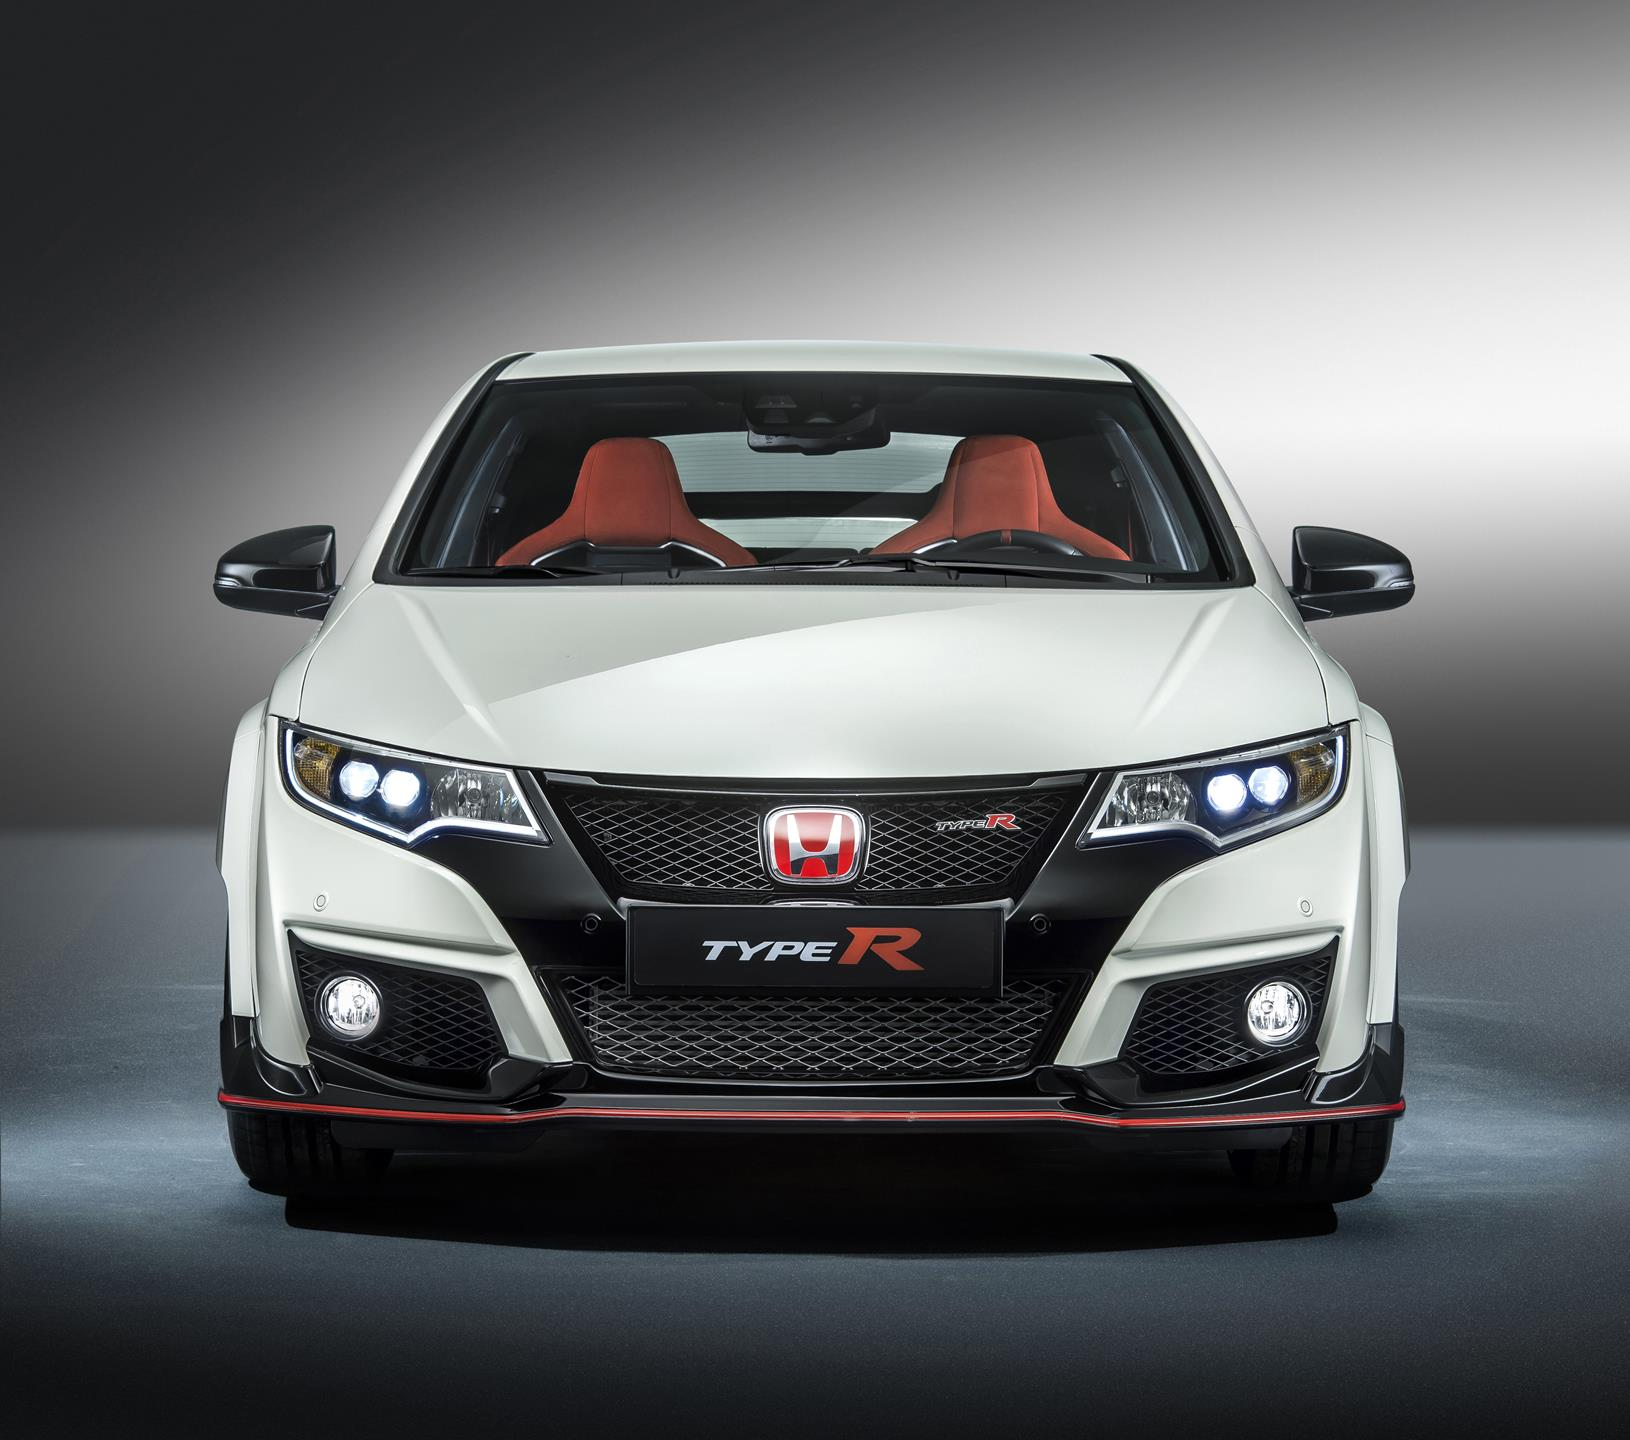 2015 Honda Civic Type R News And Information Conceptcarz Com